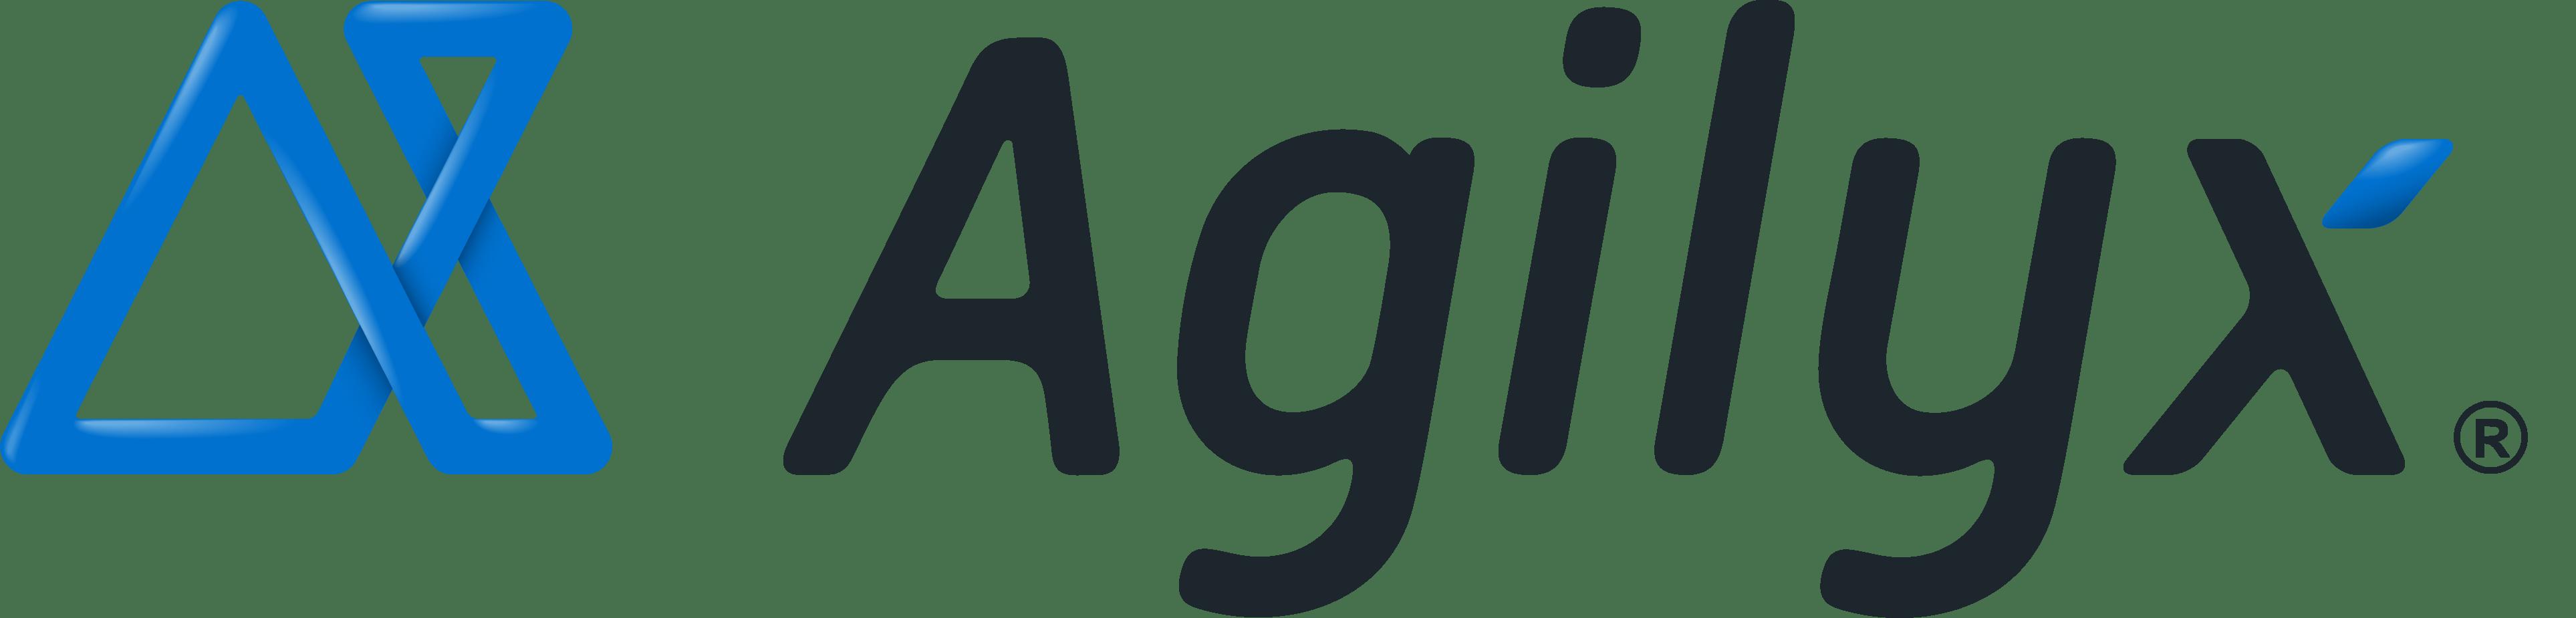 Agilyx Logo_notagline_RGB_Trademark_AUSNZ